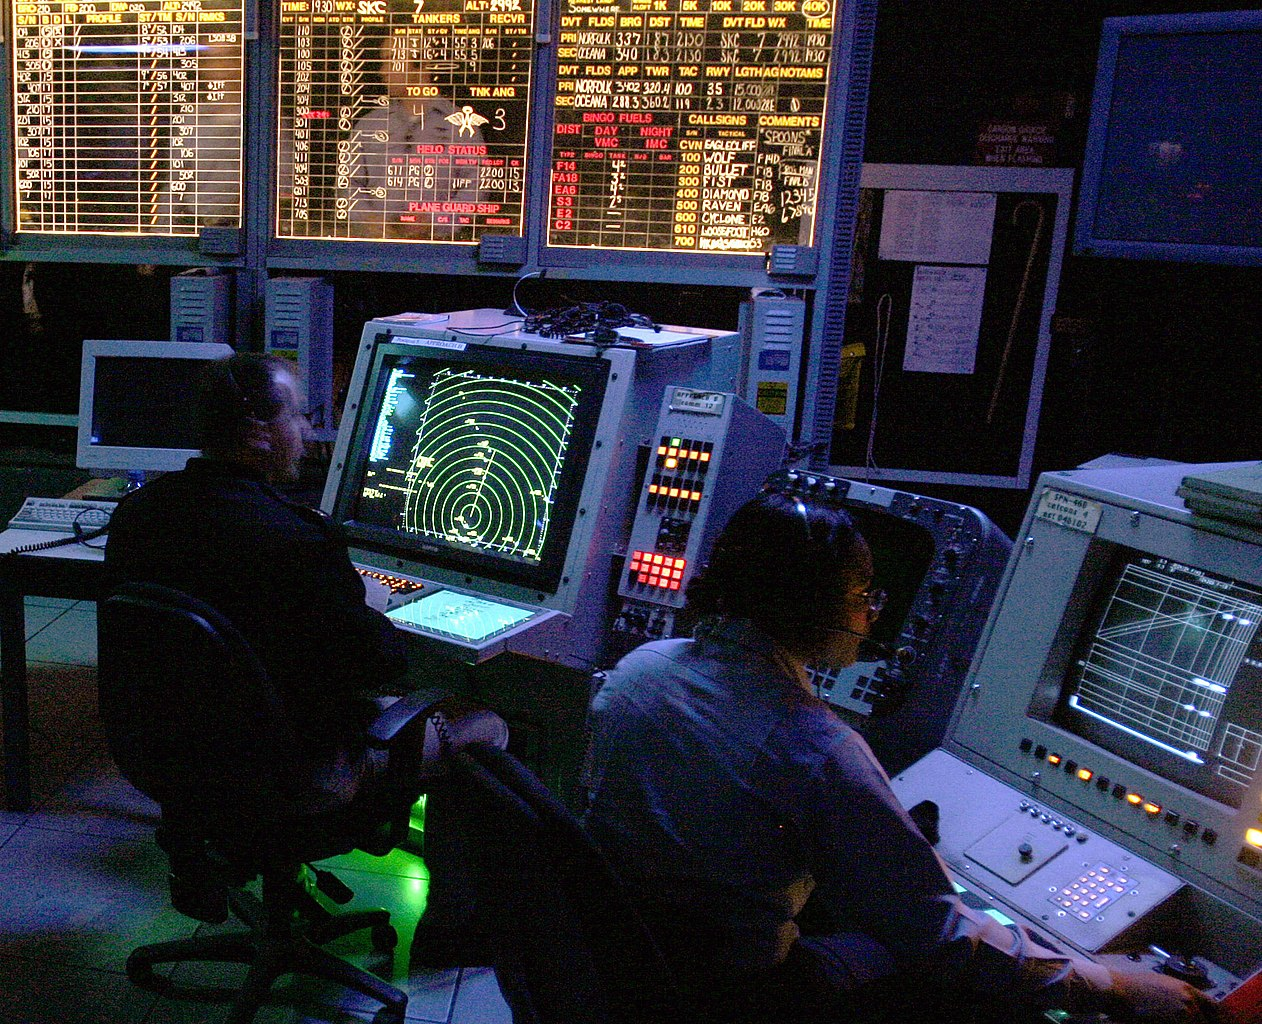 aircraft traffic control